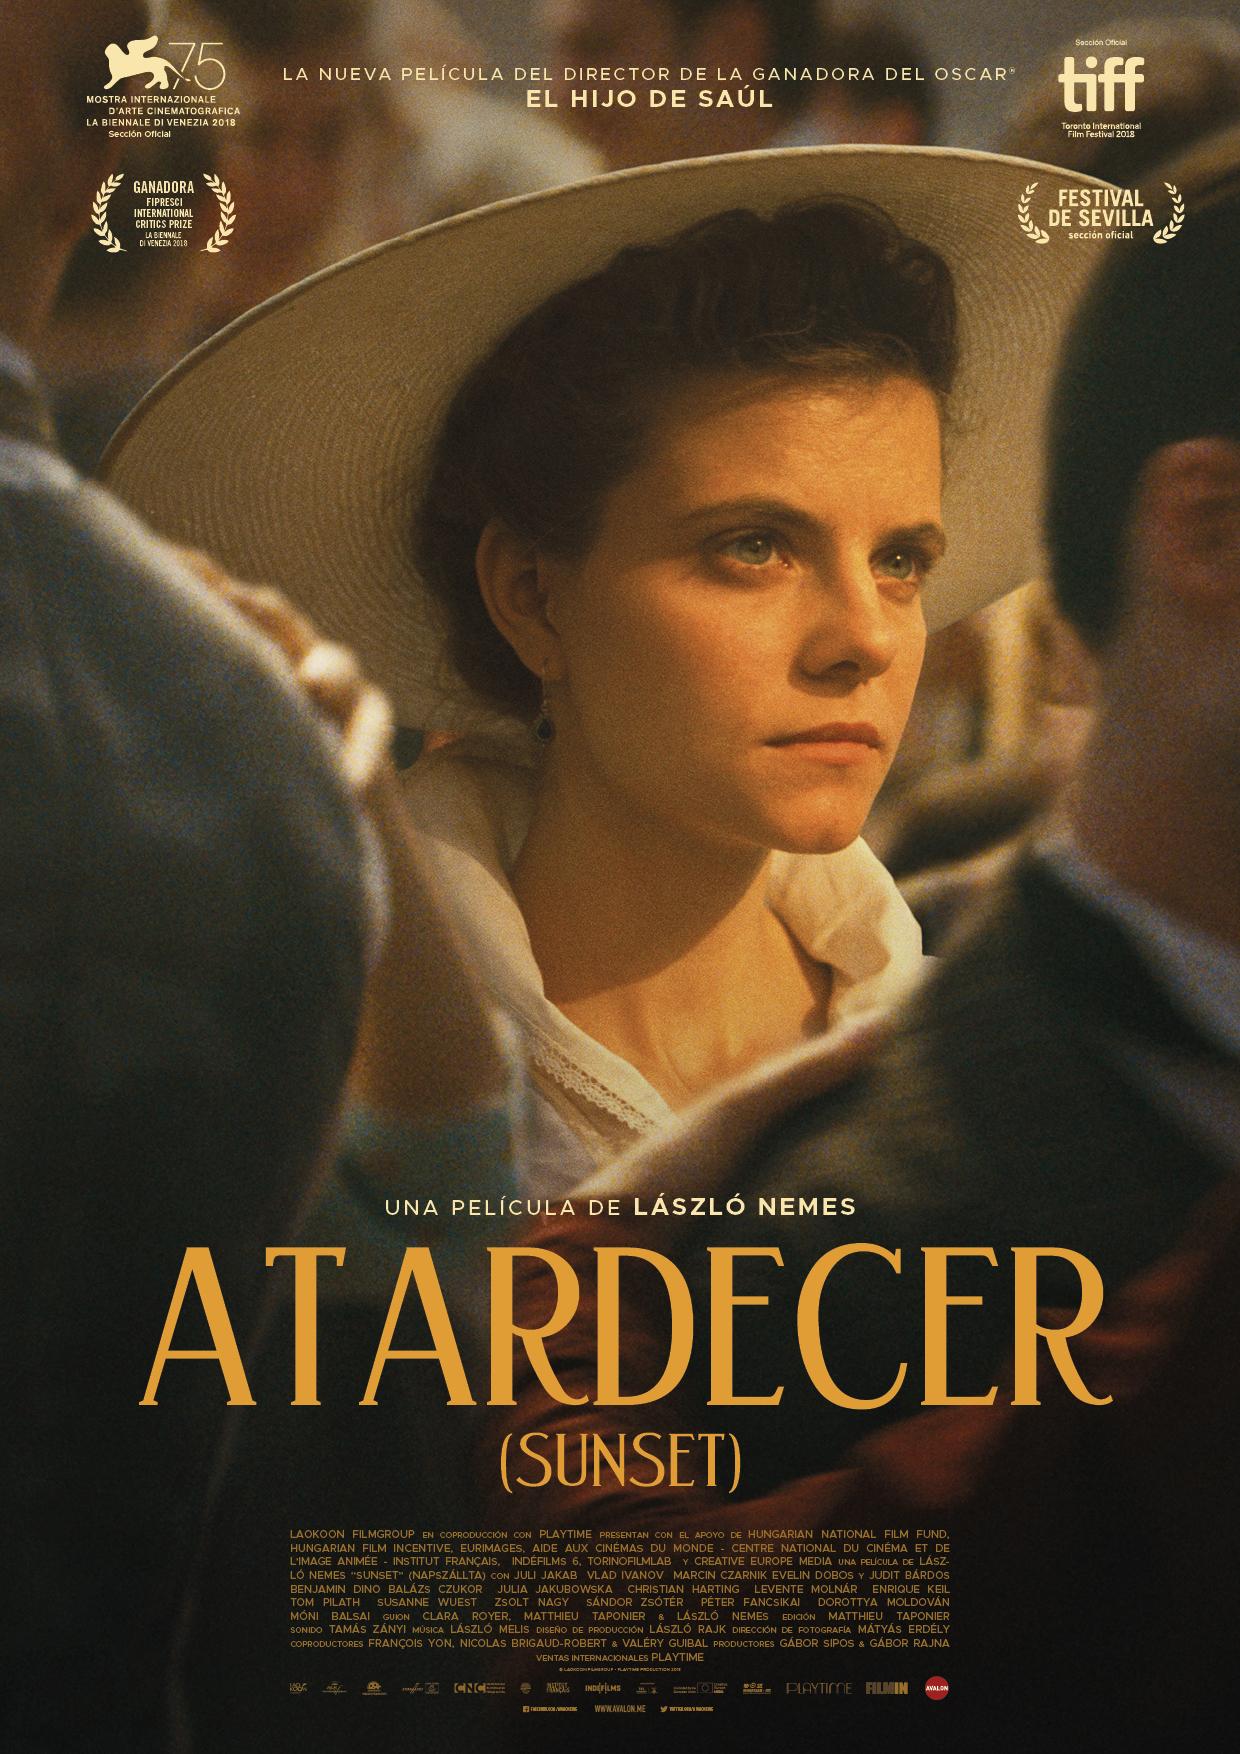 'Atardecer': Póster y tráiler en español de la película de László Nemes